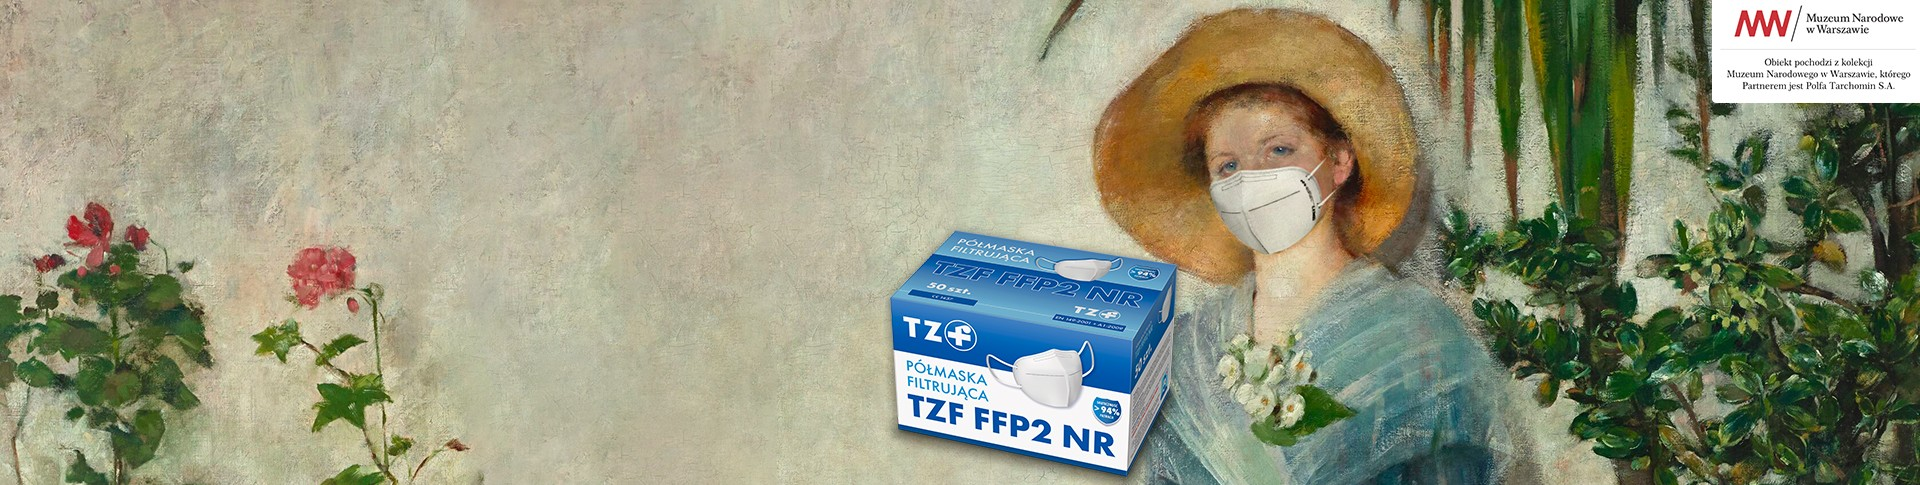 Półmaska TZF FFP2 NR